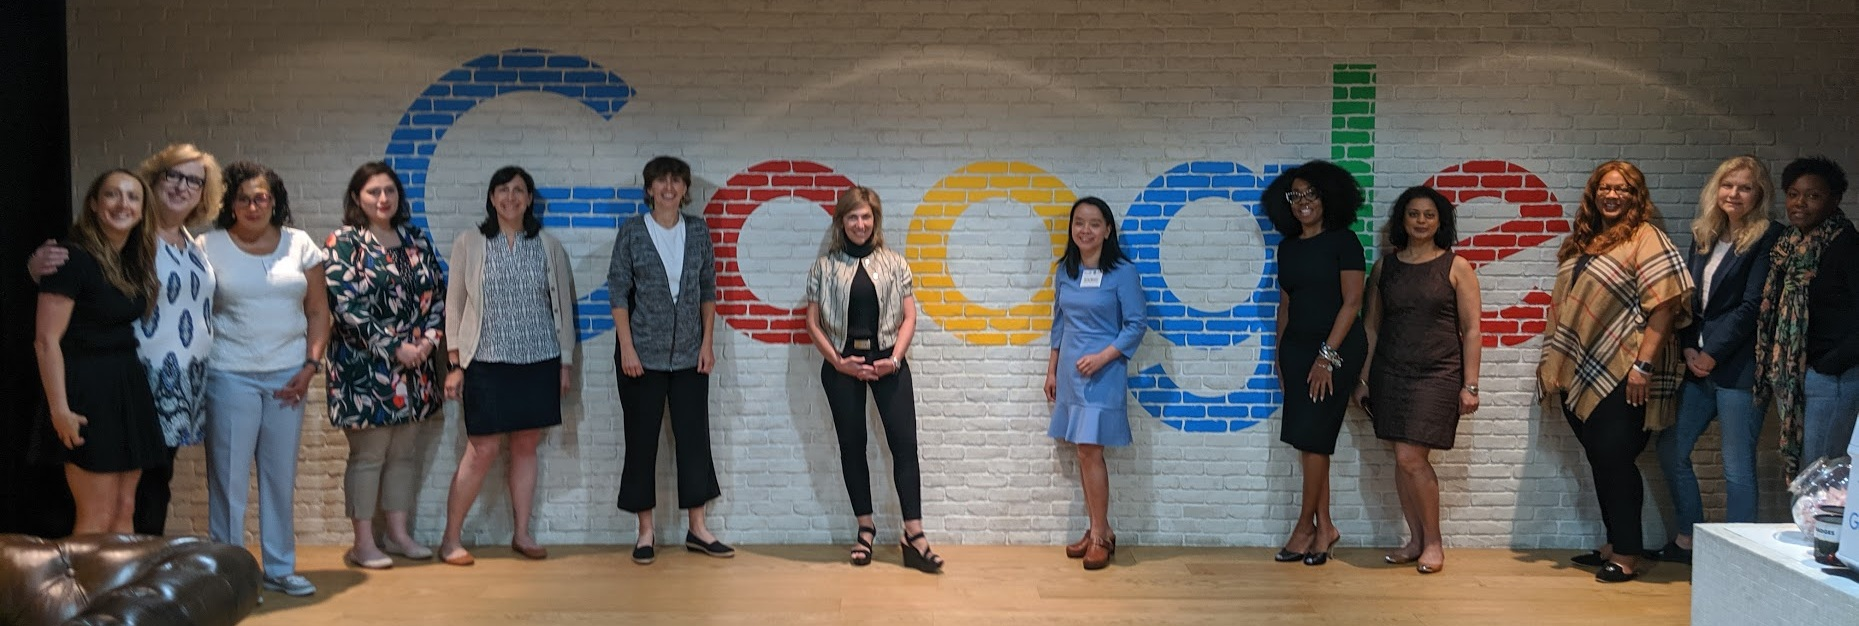 google-program-attendees.jpg